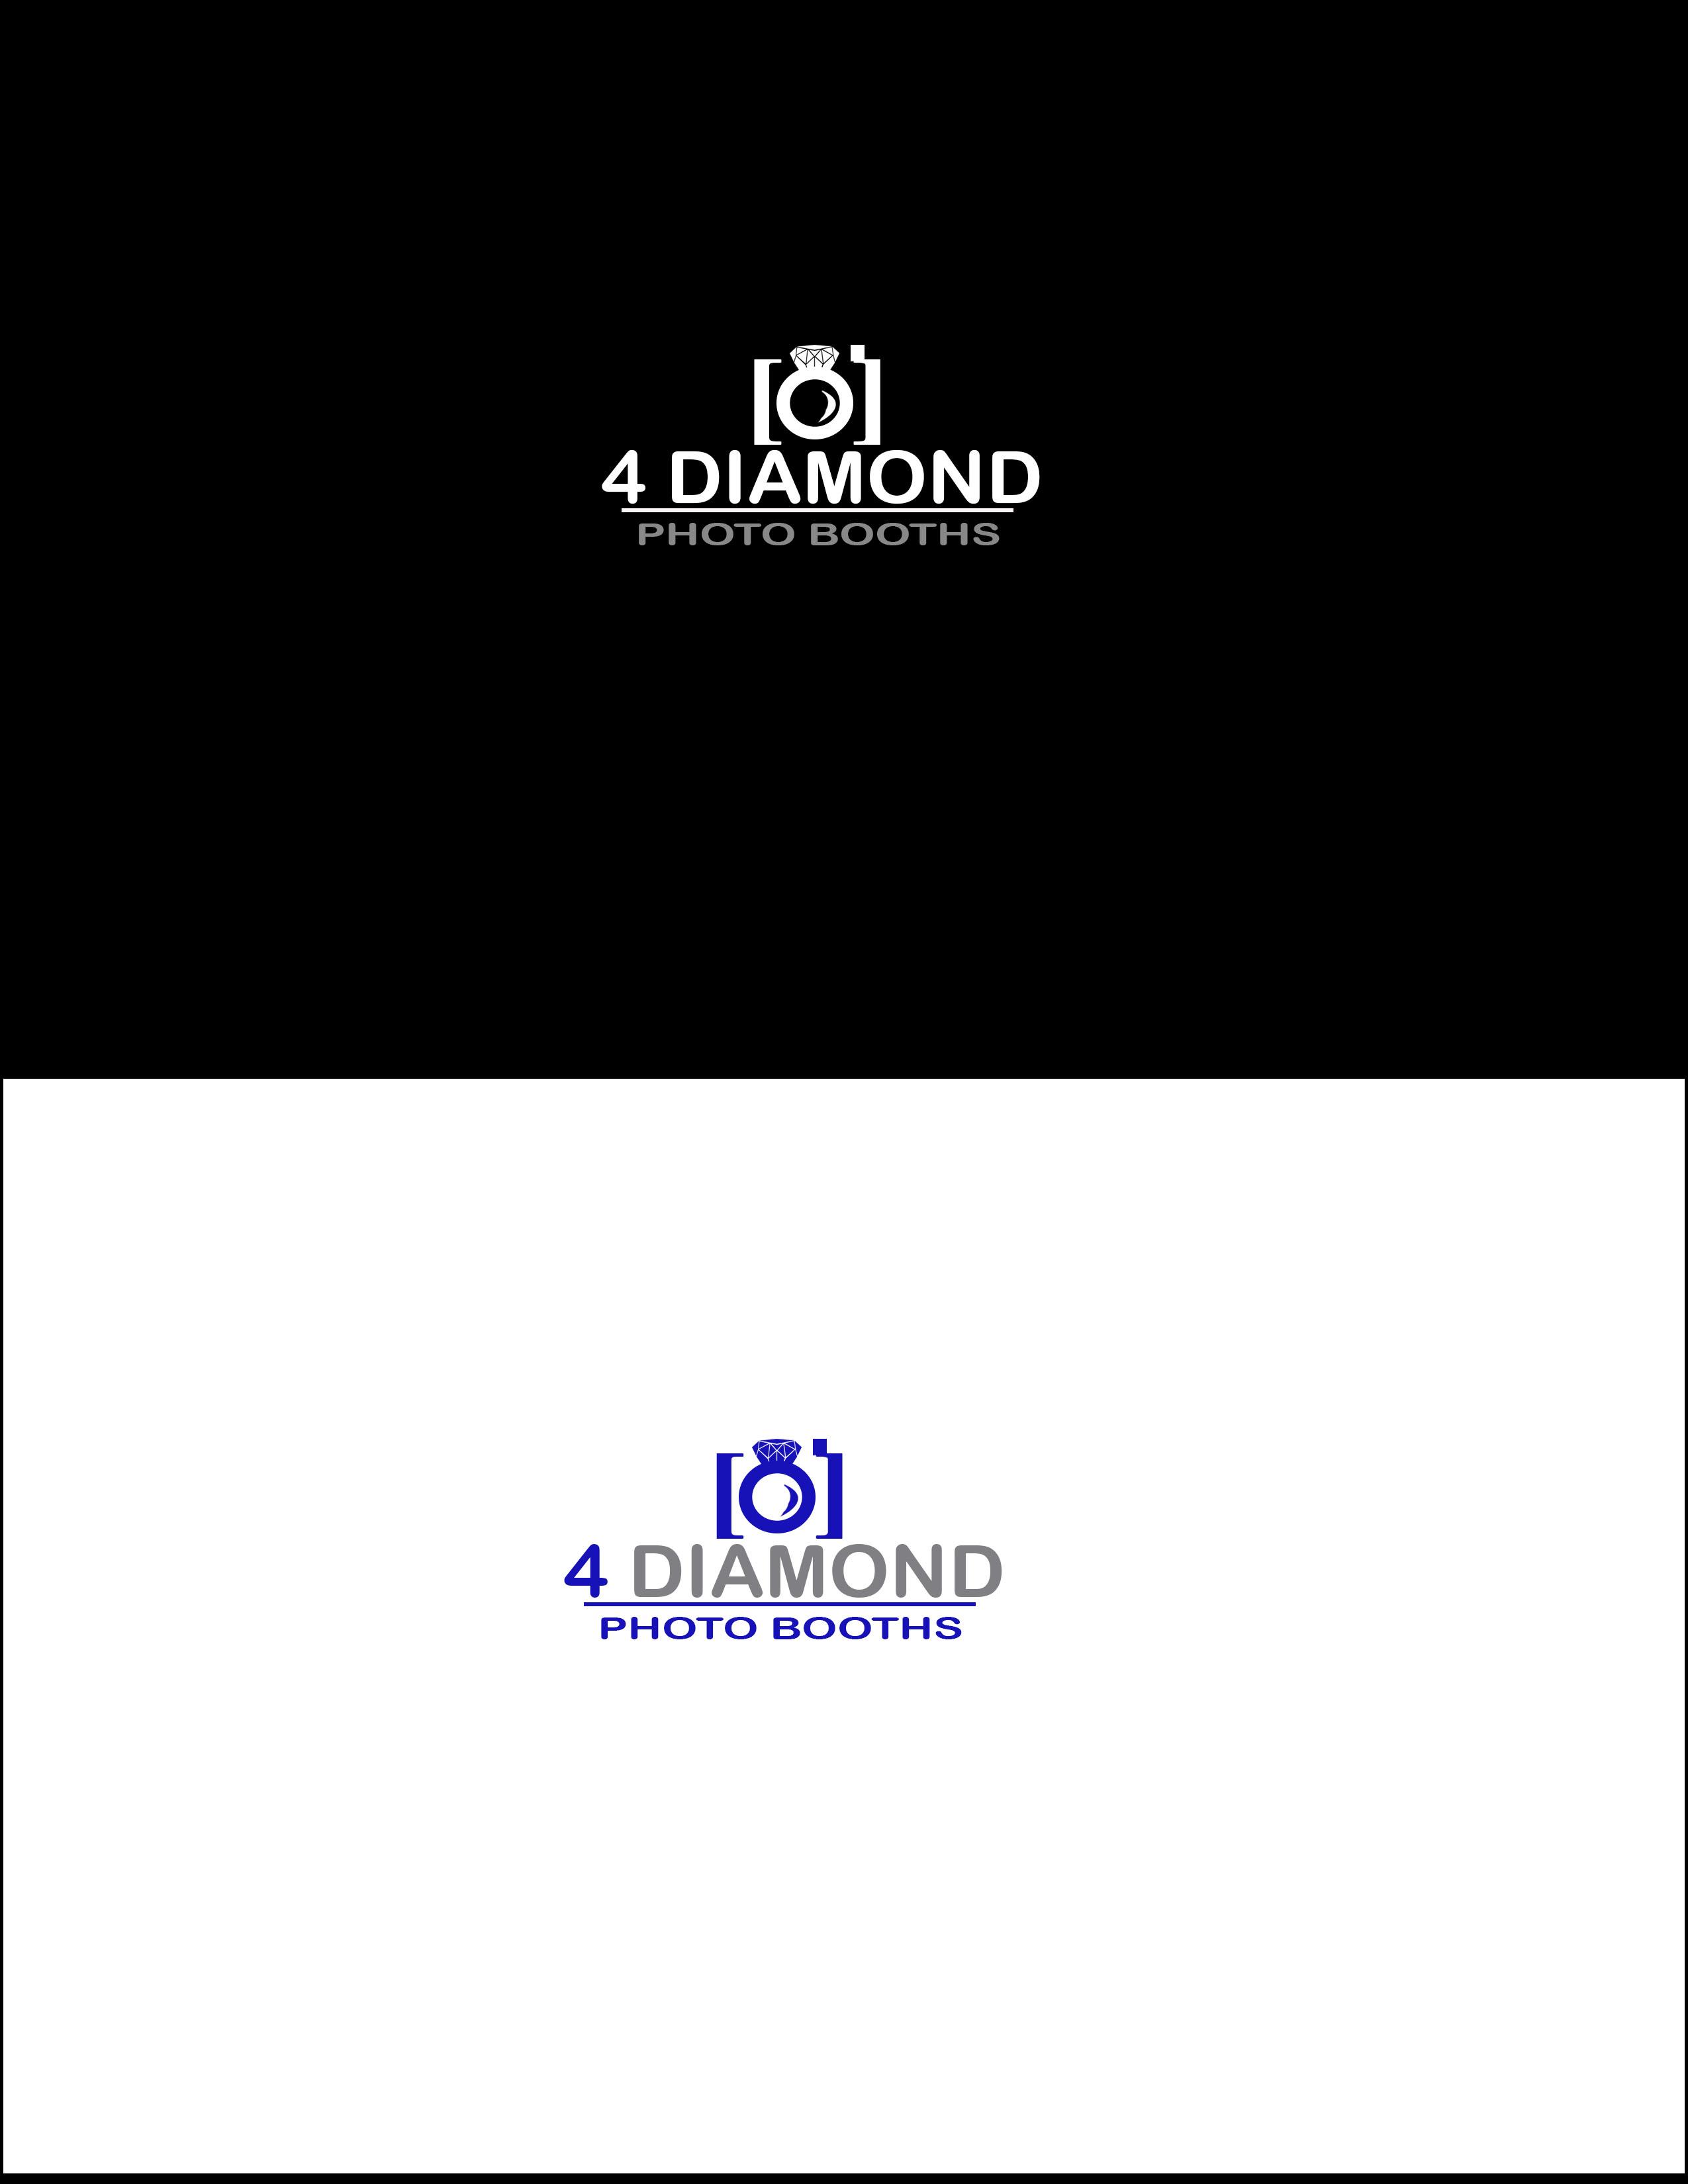 Logo Design by kjm22 - Entry No. 31 in the Logo Design Contest Creative Logo Design for 4 Diamond Photo Booths.